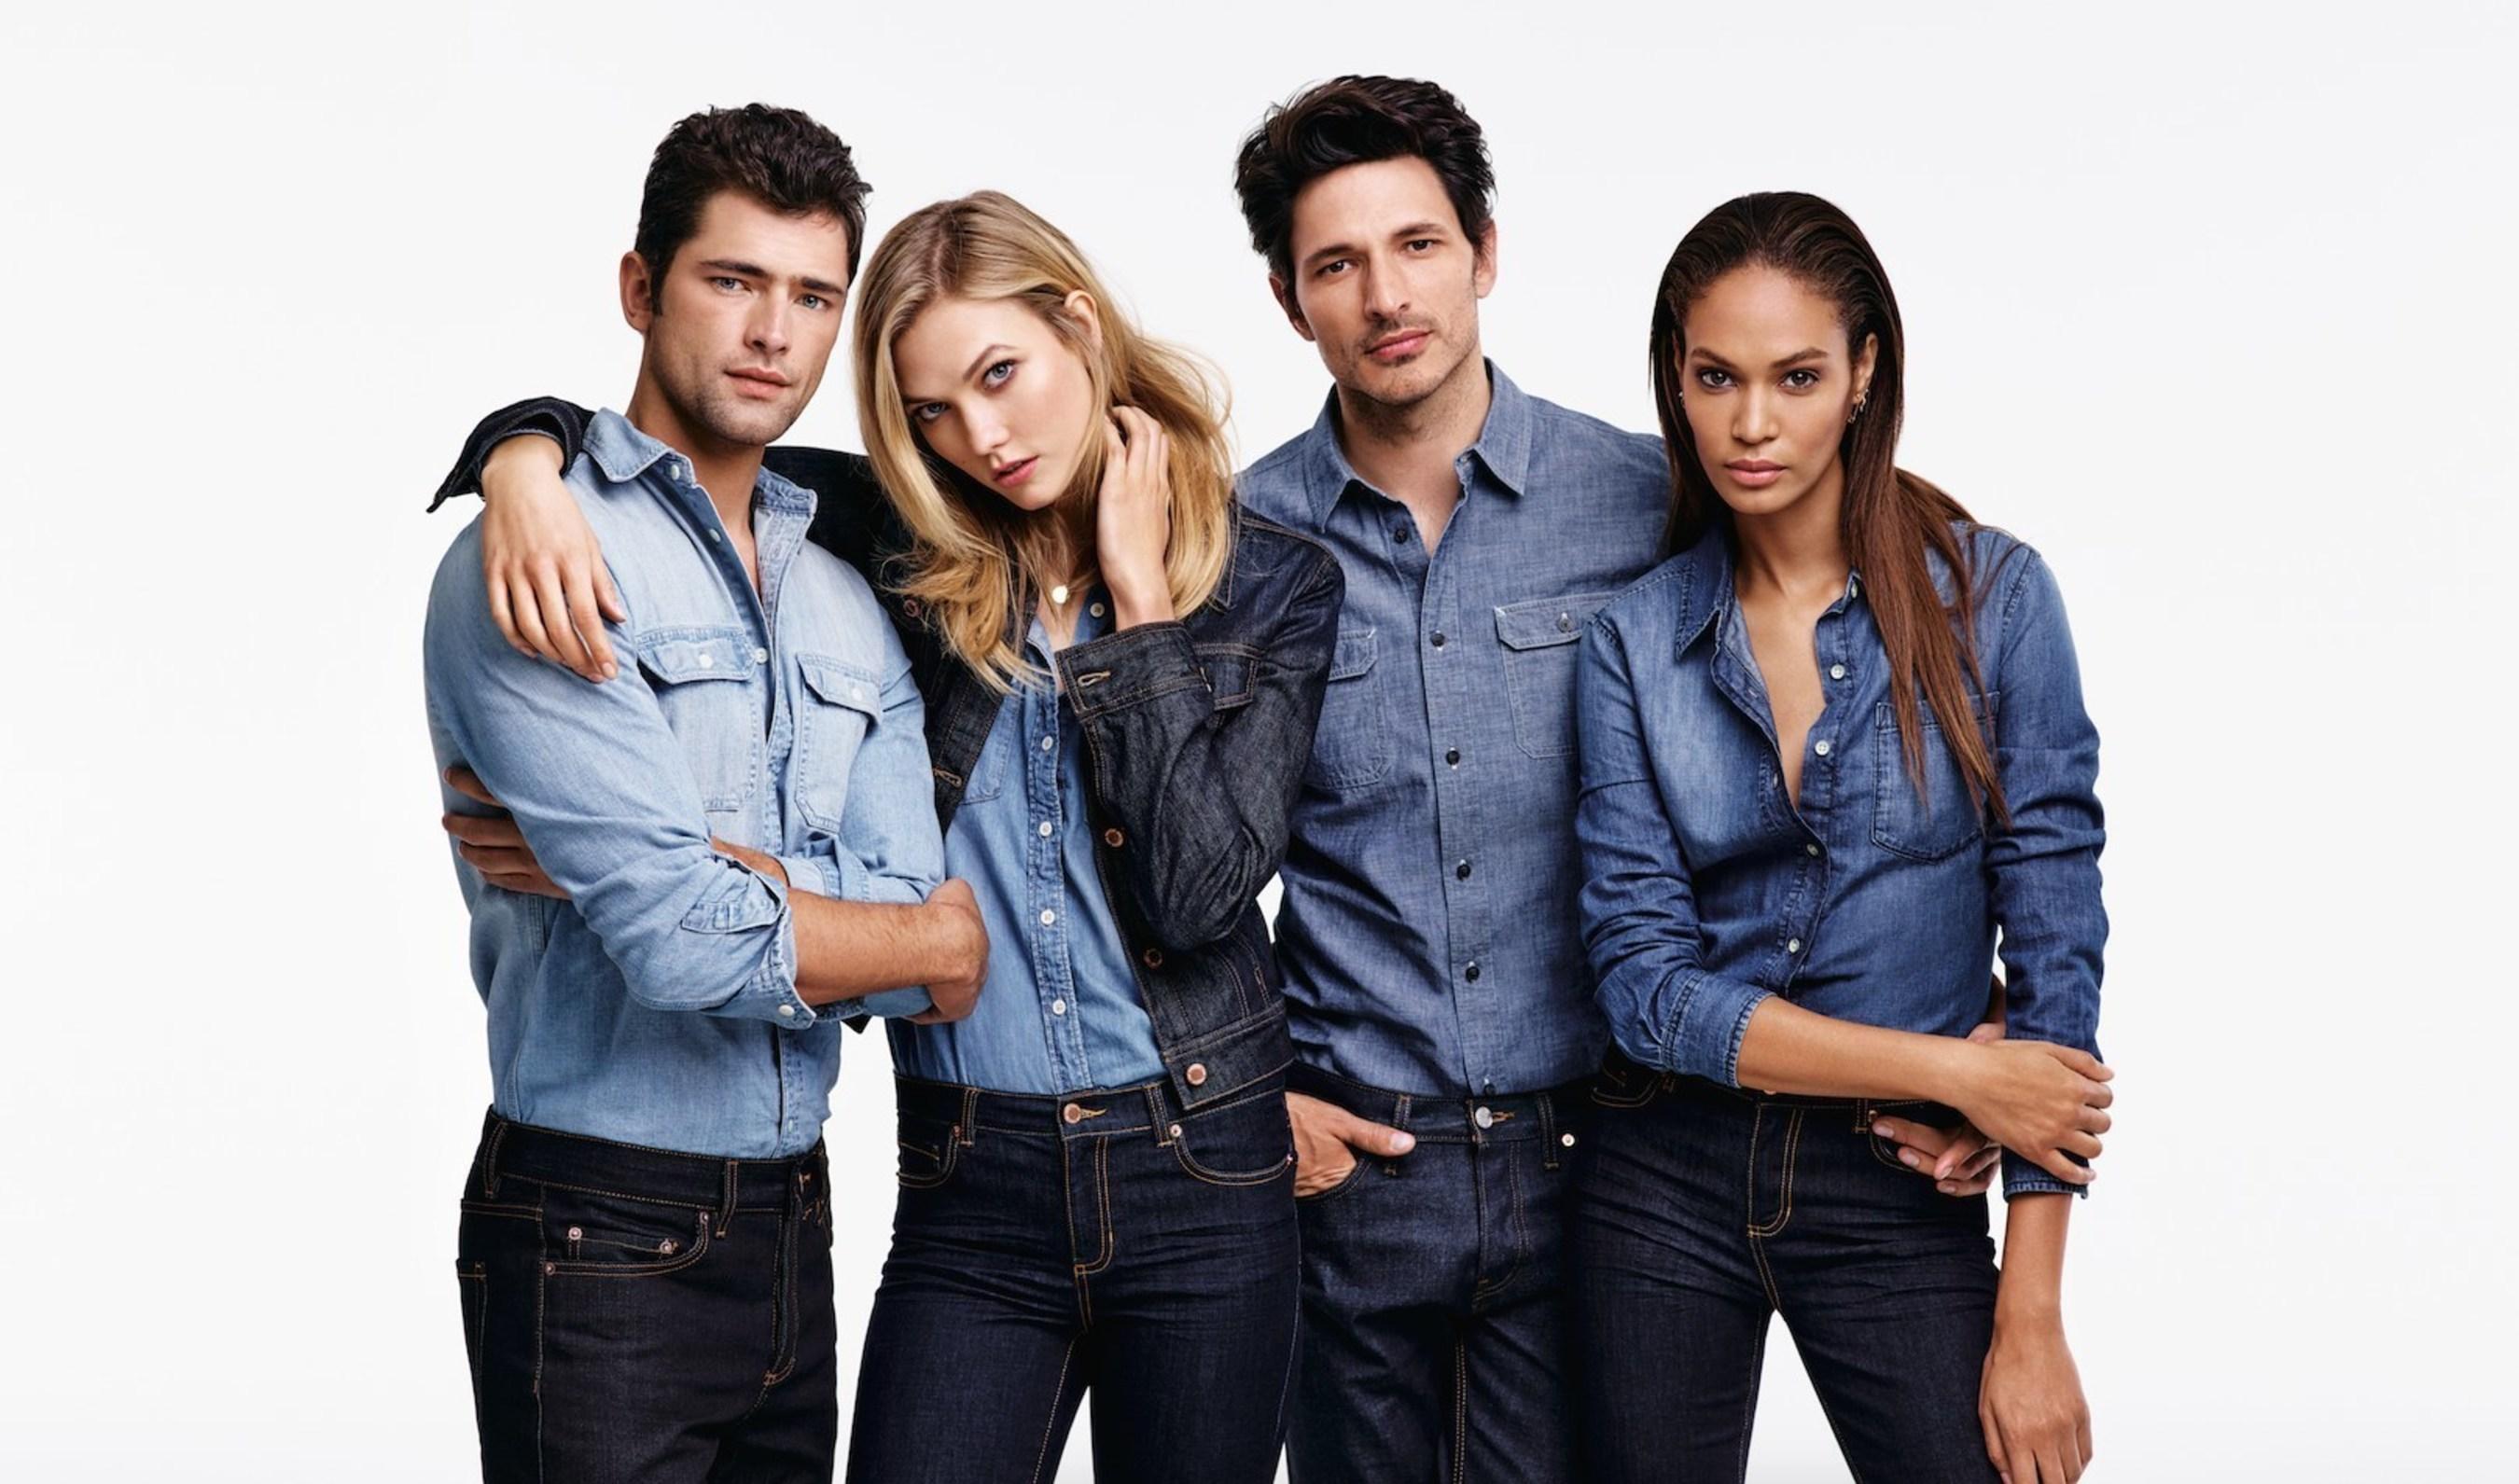 Karlie Kloss, Joan Smalls, Sean O'Pry and Andres Velencoso Star in the Fall 2015 Joe Fresh Campaign